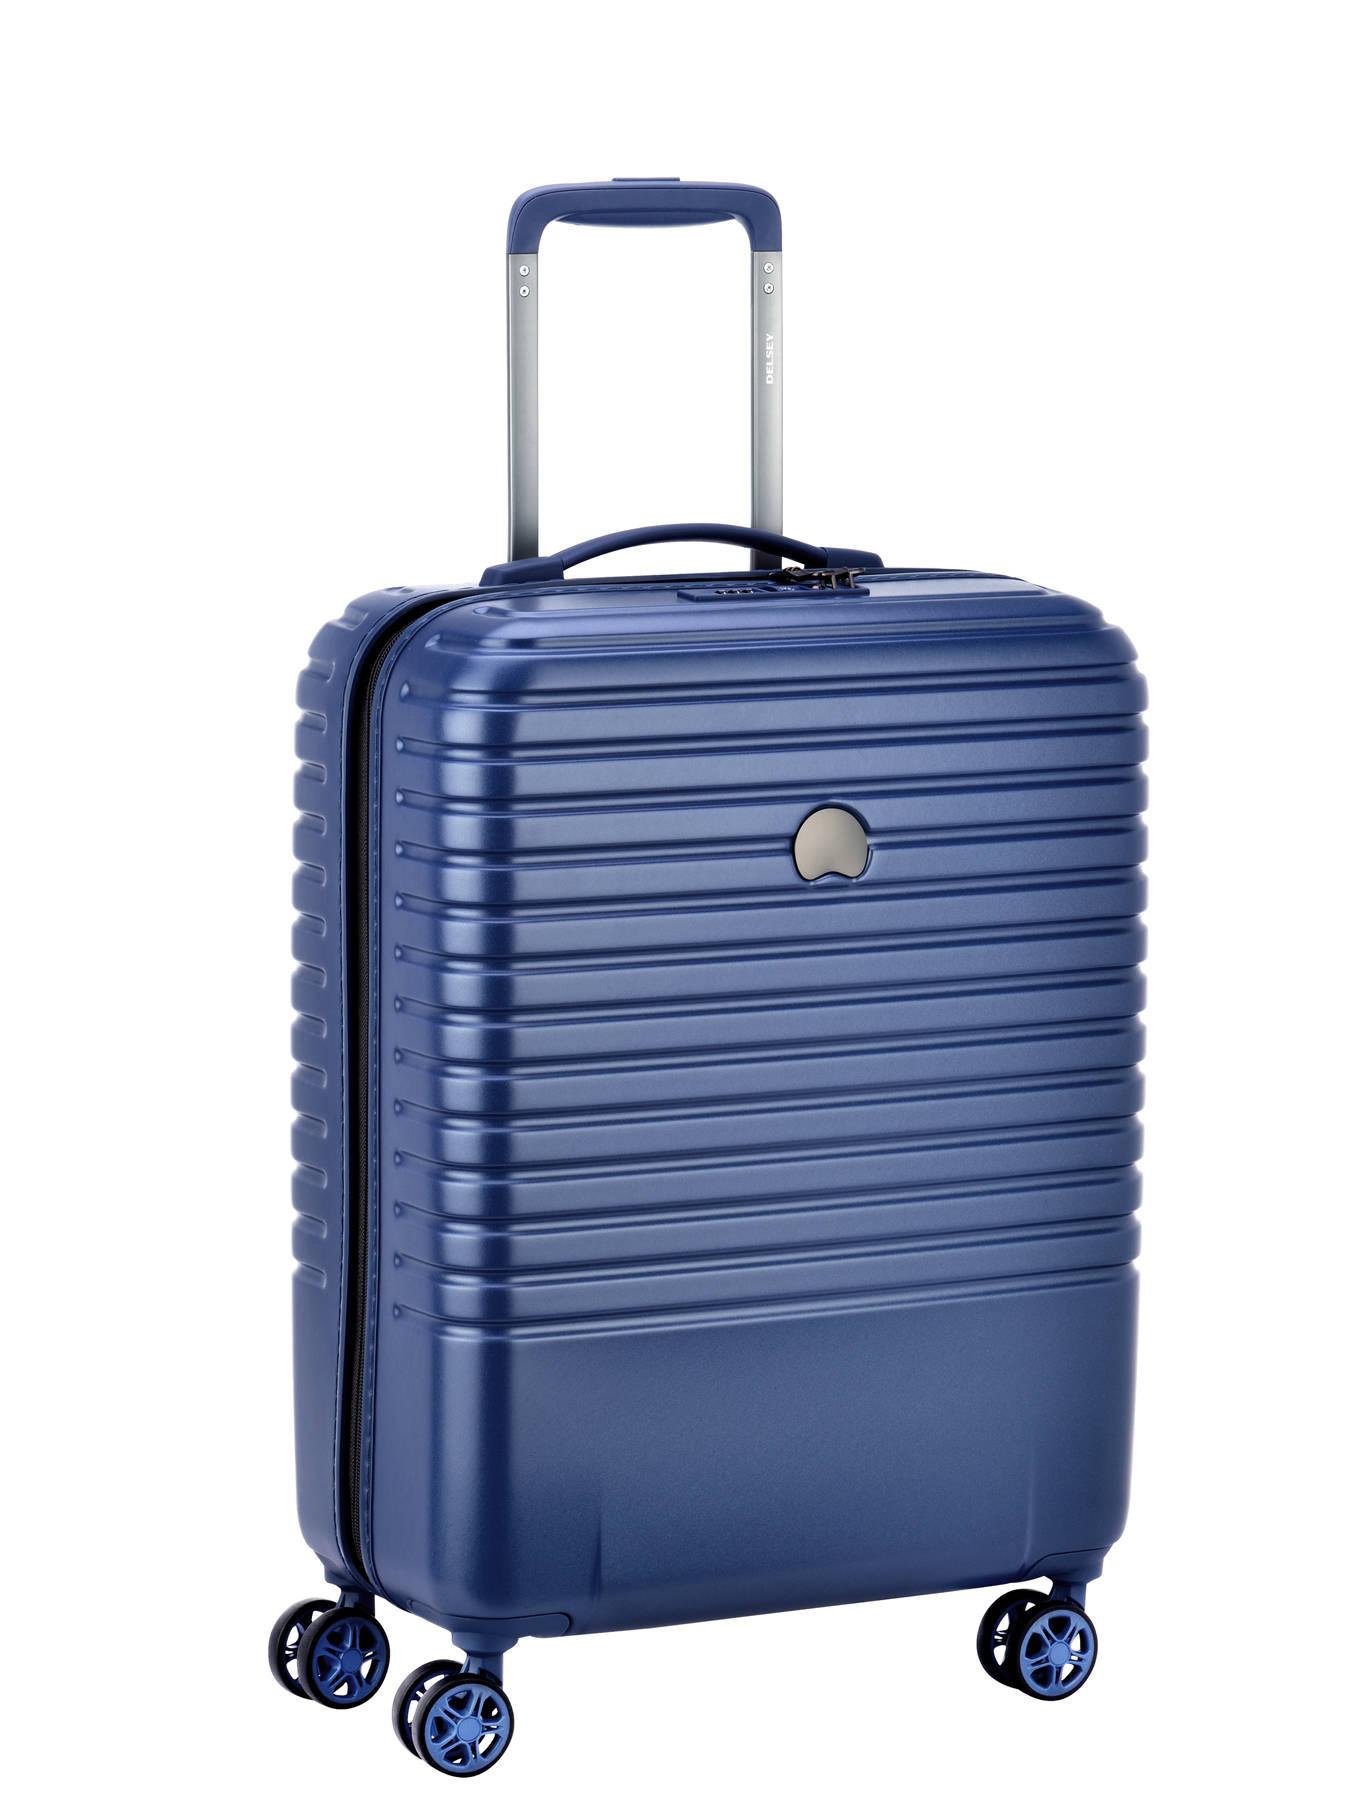 valise cabine delsey caumartin caumartin en vente au meilleur prix. Black Bedroom Furniture Sets. Home Design Ideas